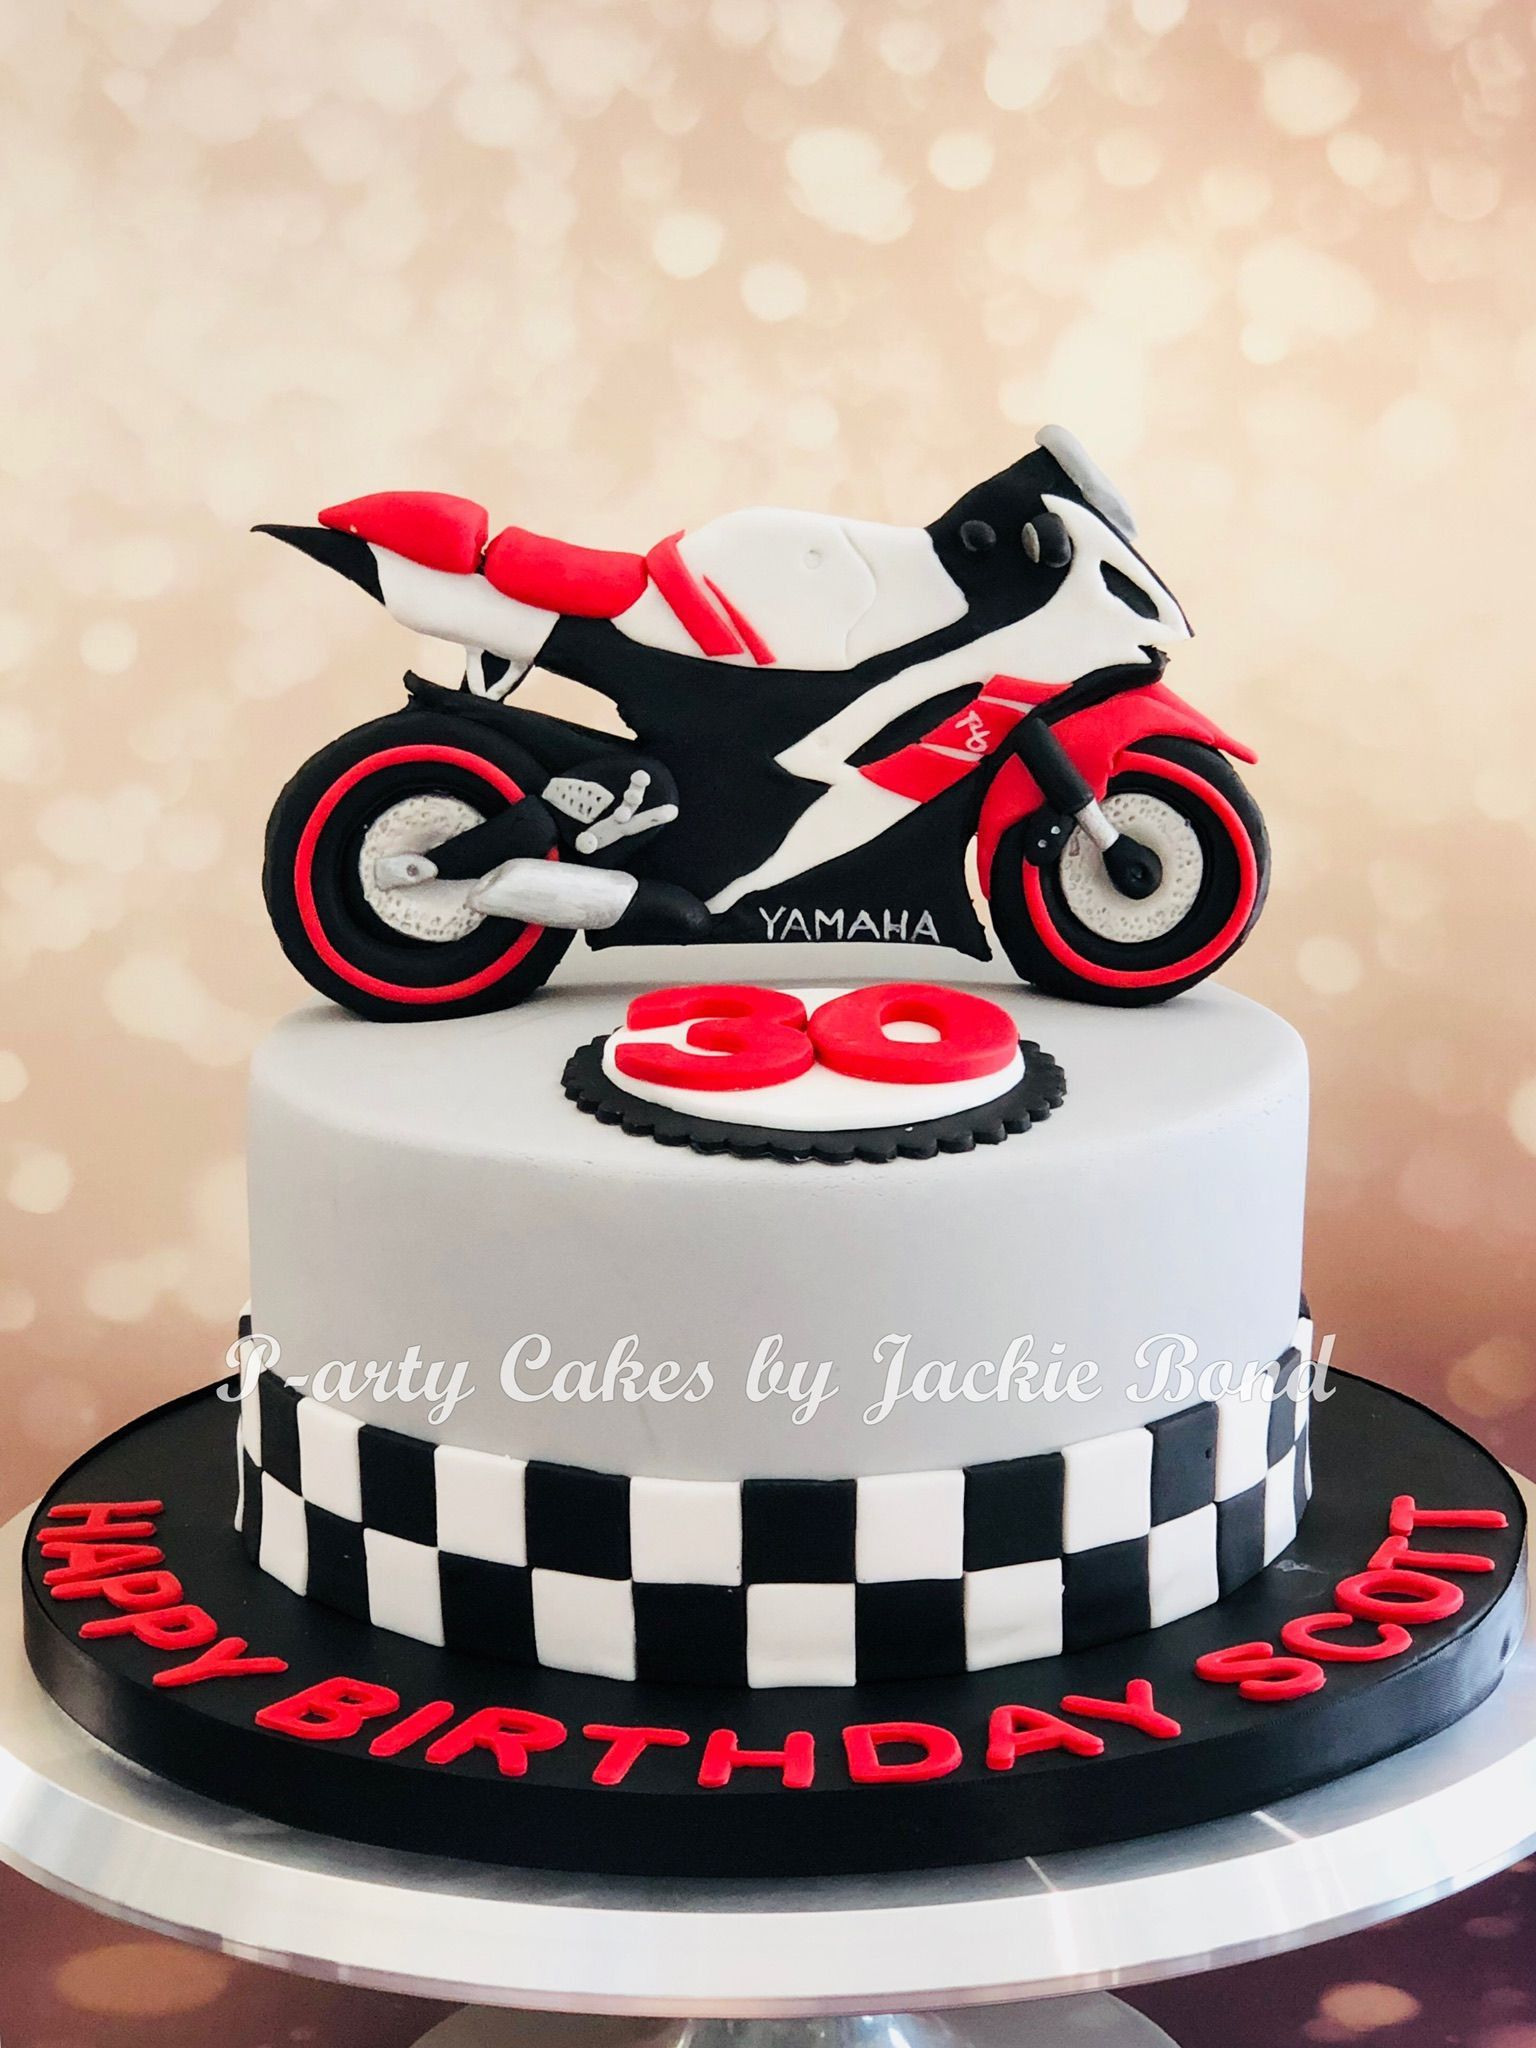 Motorbike Yamaha R6 Cake Oslavy Narozky Motorcycle